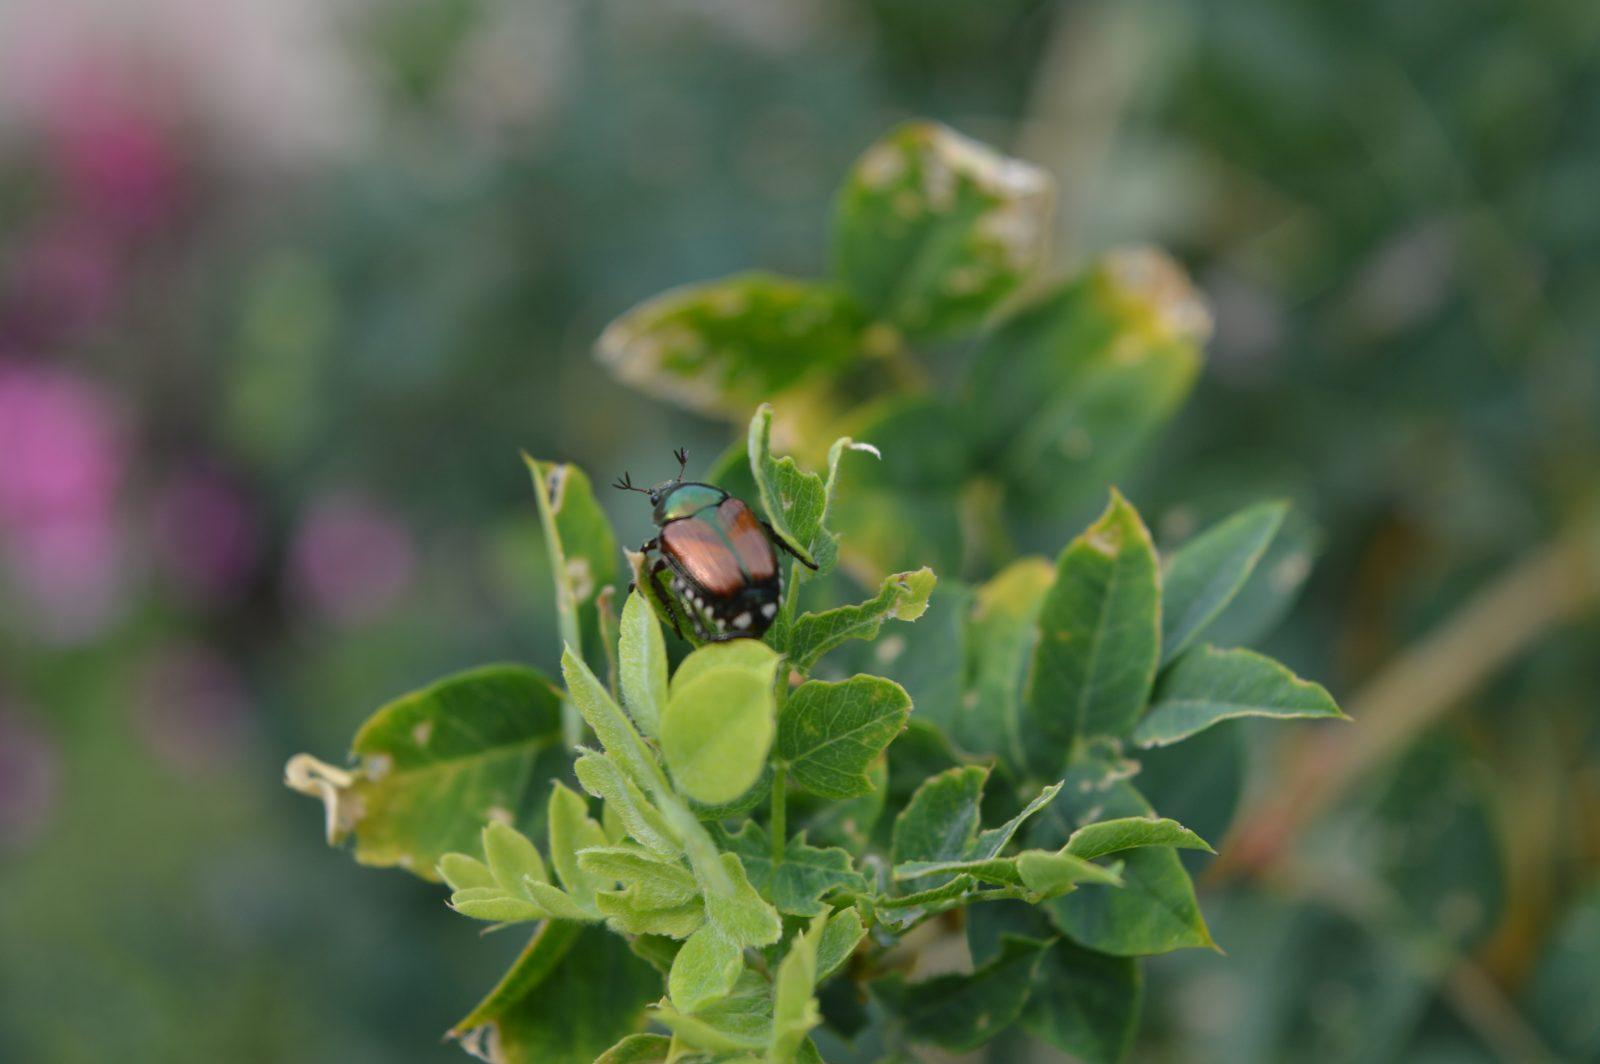 Preventing Pesky Garden Pests